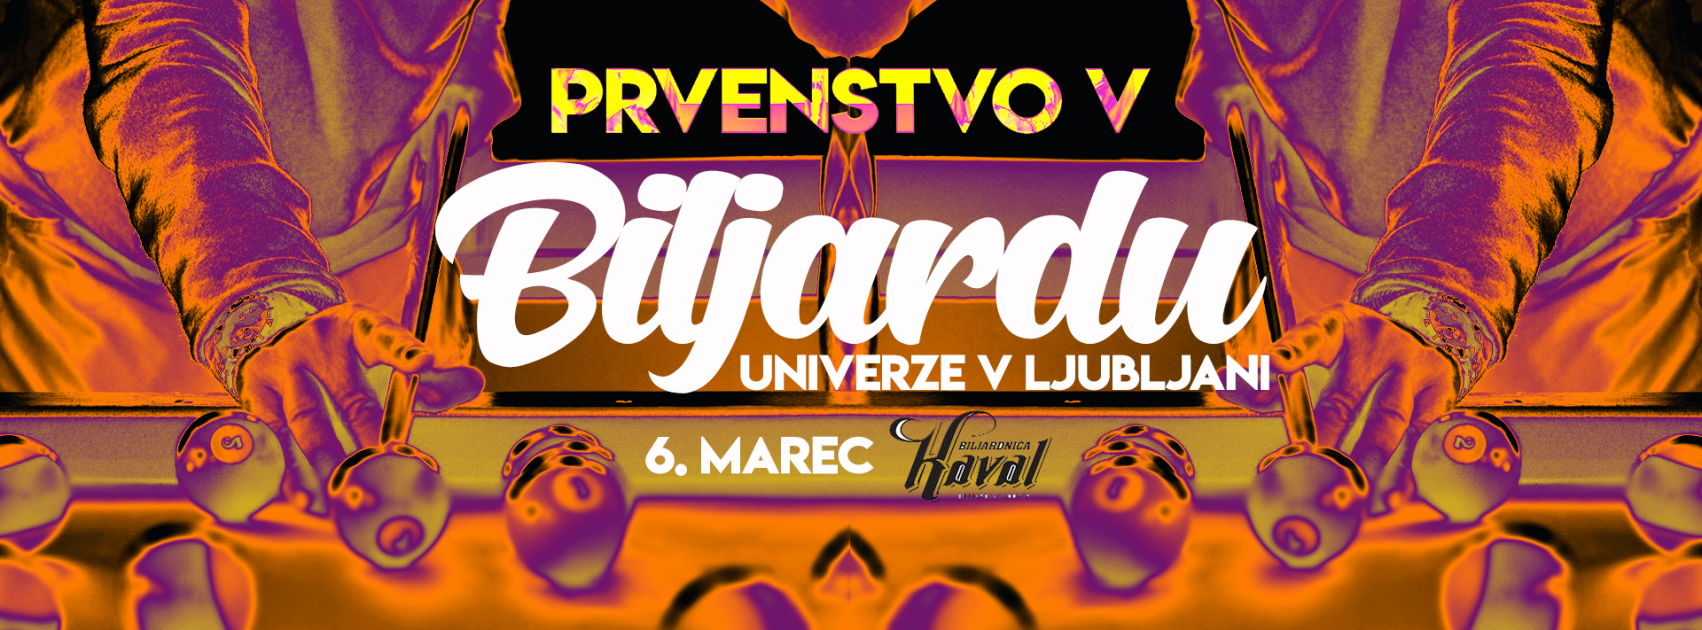 cover_prvenstvo_v_biljardu_ul.png